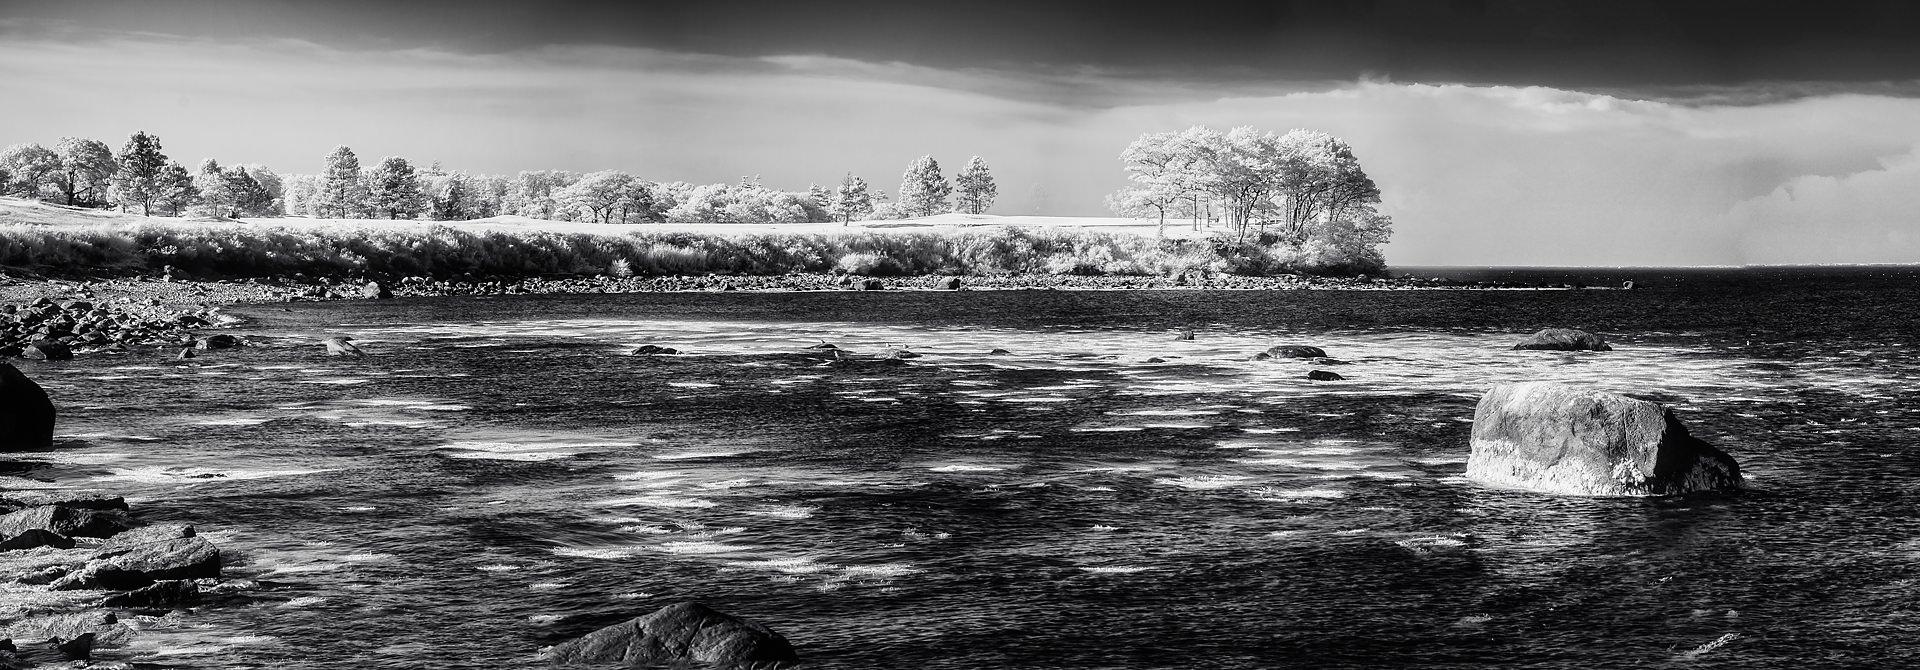 Samoset Breakwater, 2013